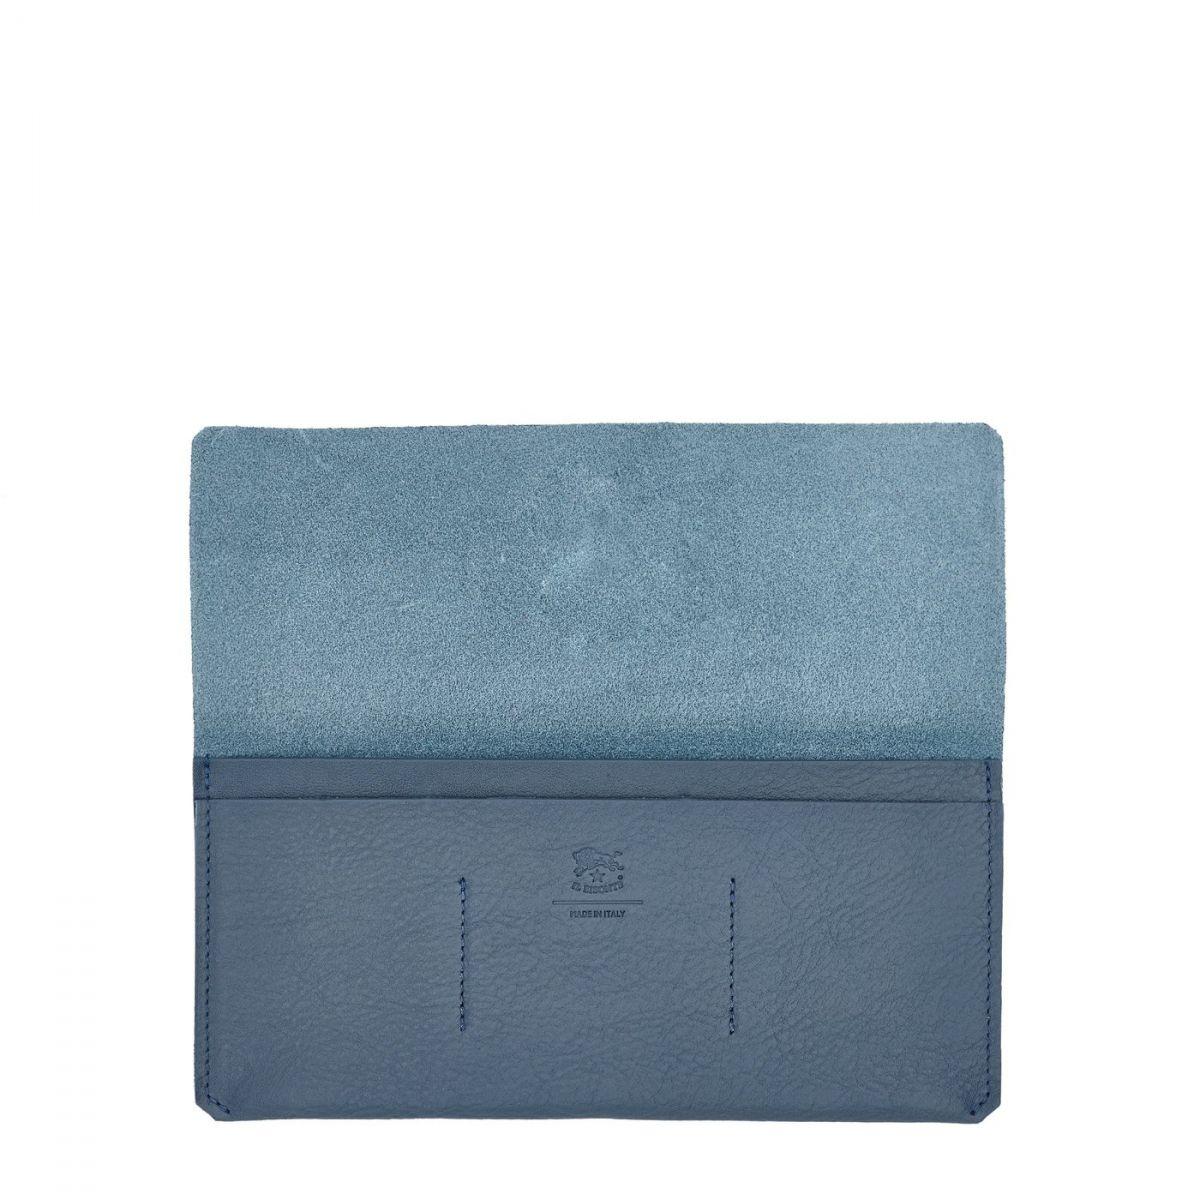 Bi-Fold Wallet  in Cowhide Leather SBW043 color Sugar | Details